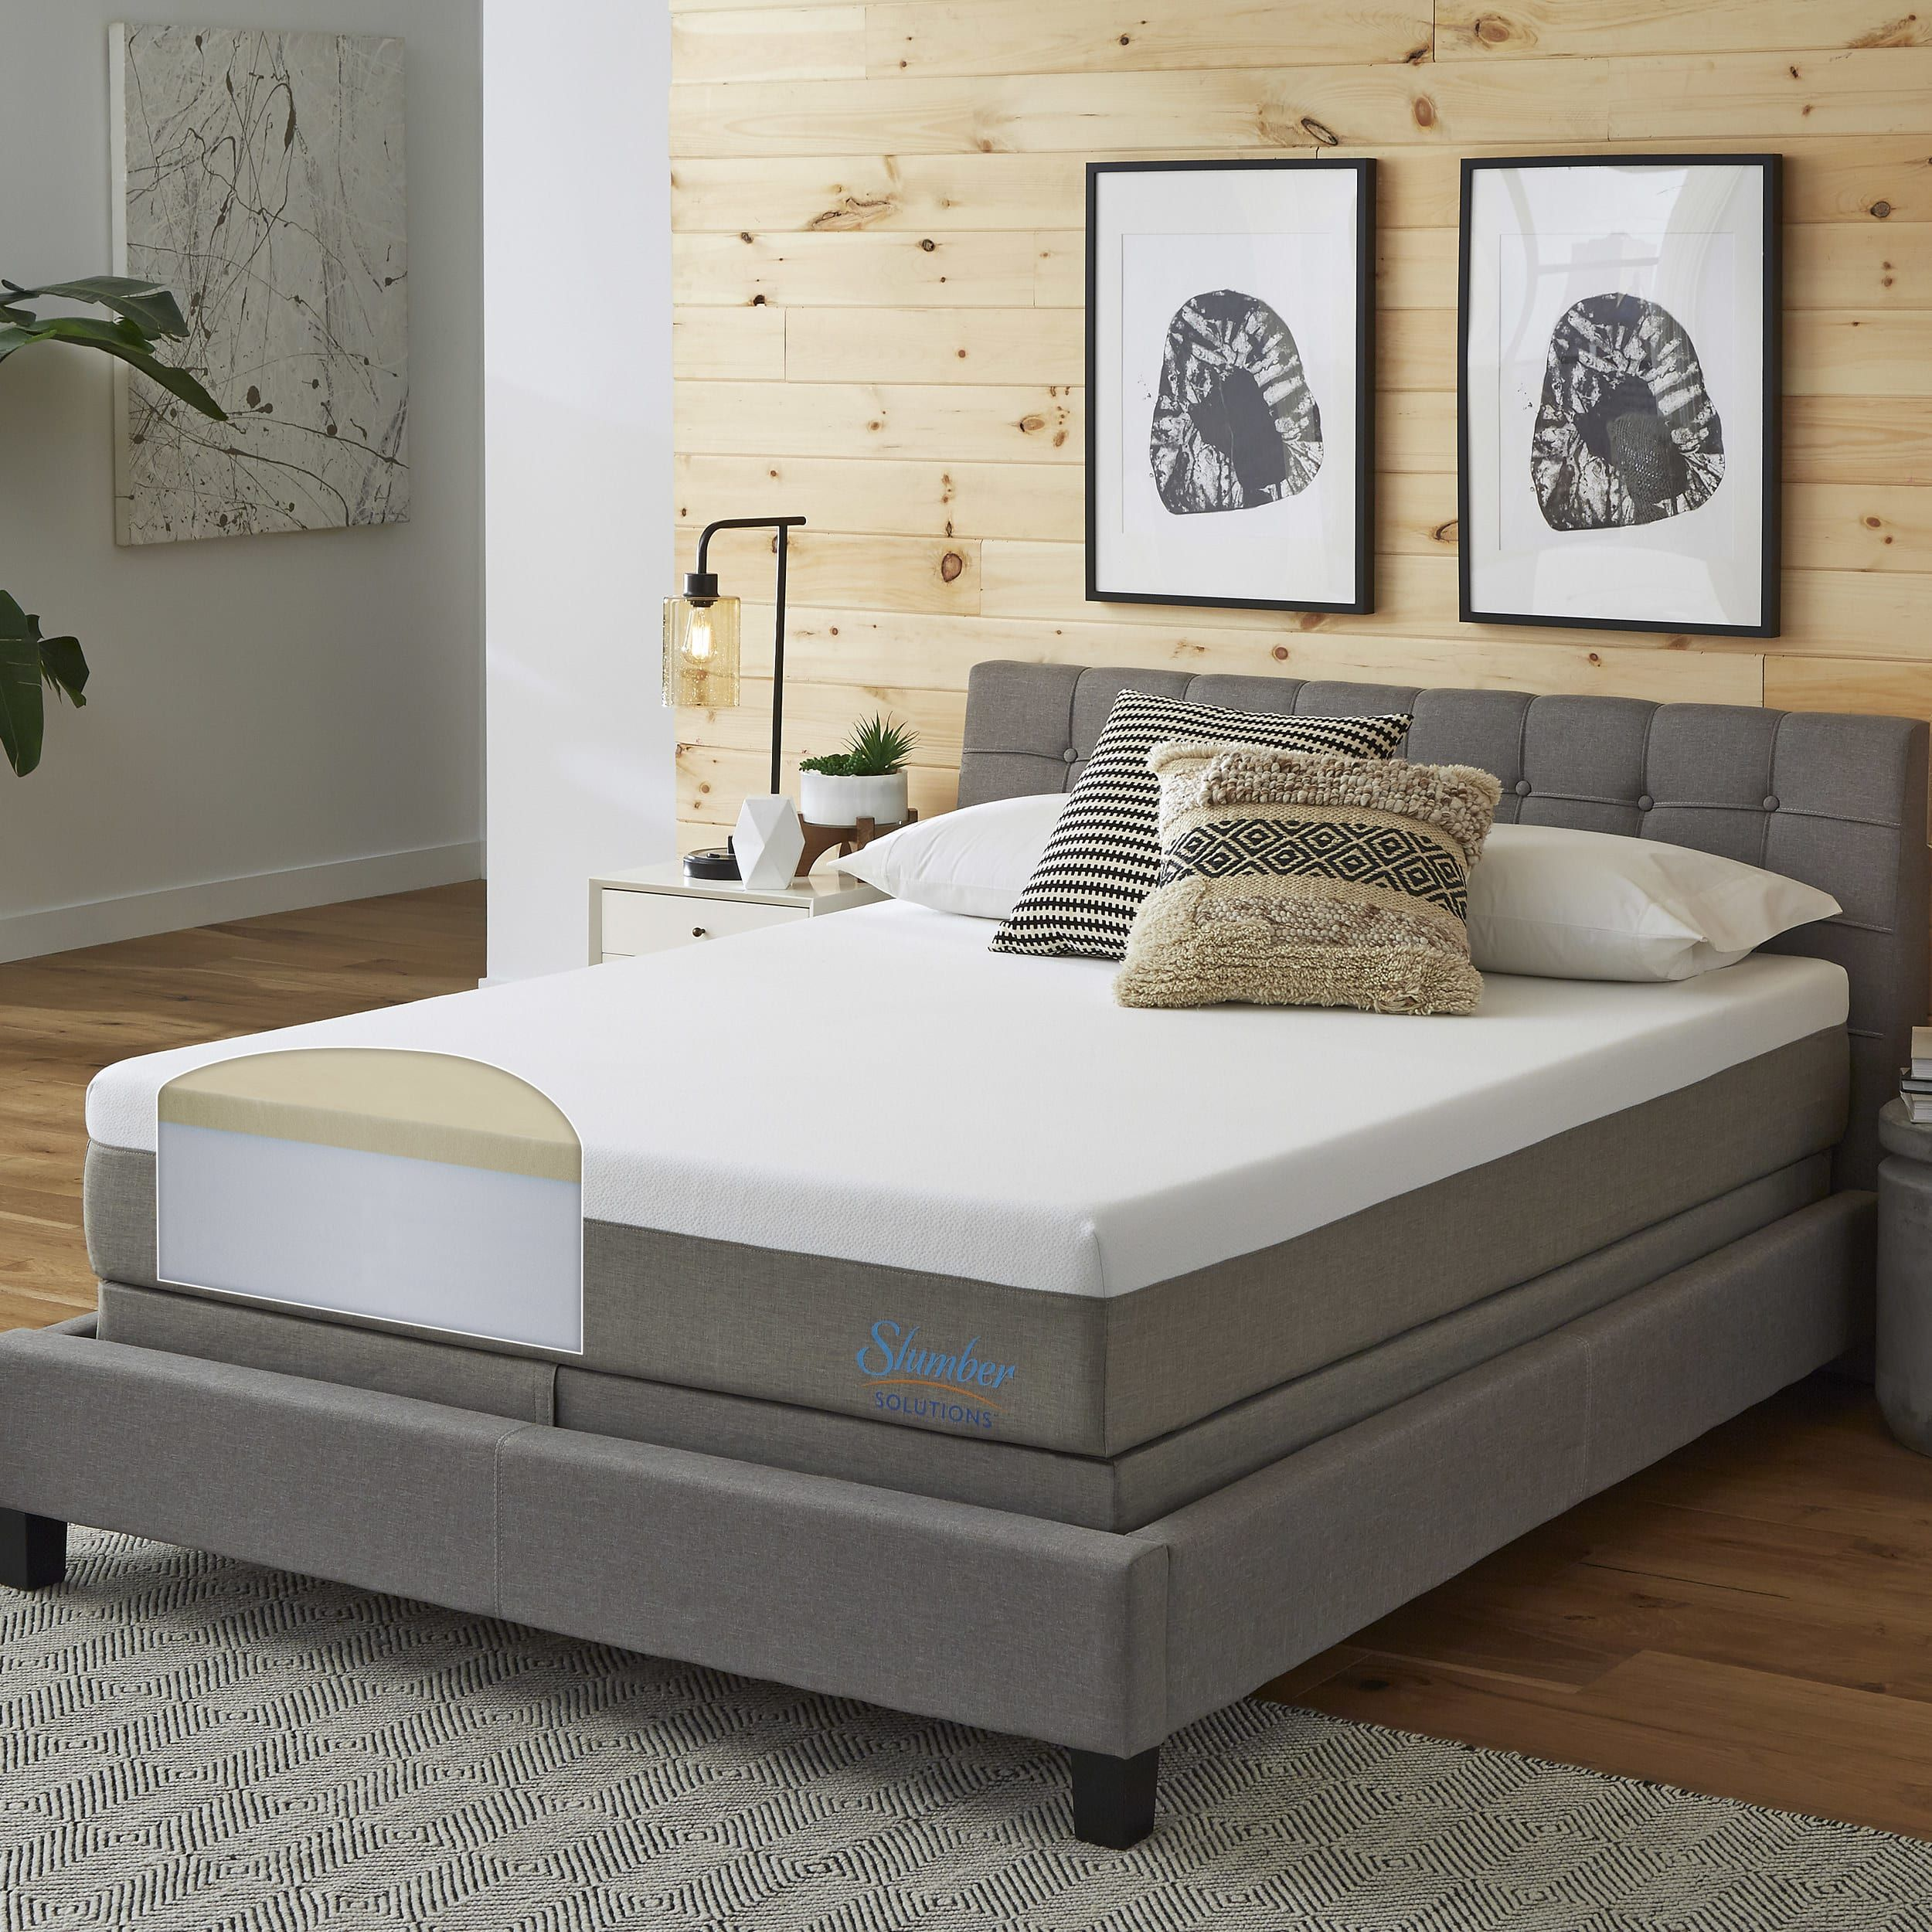 Slumber Solutions Essentials 10 Inch California King Size Memory Foam Mat King Size Memory Foam Mattress Mattress Sets